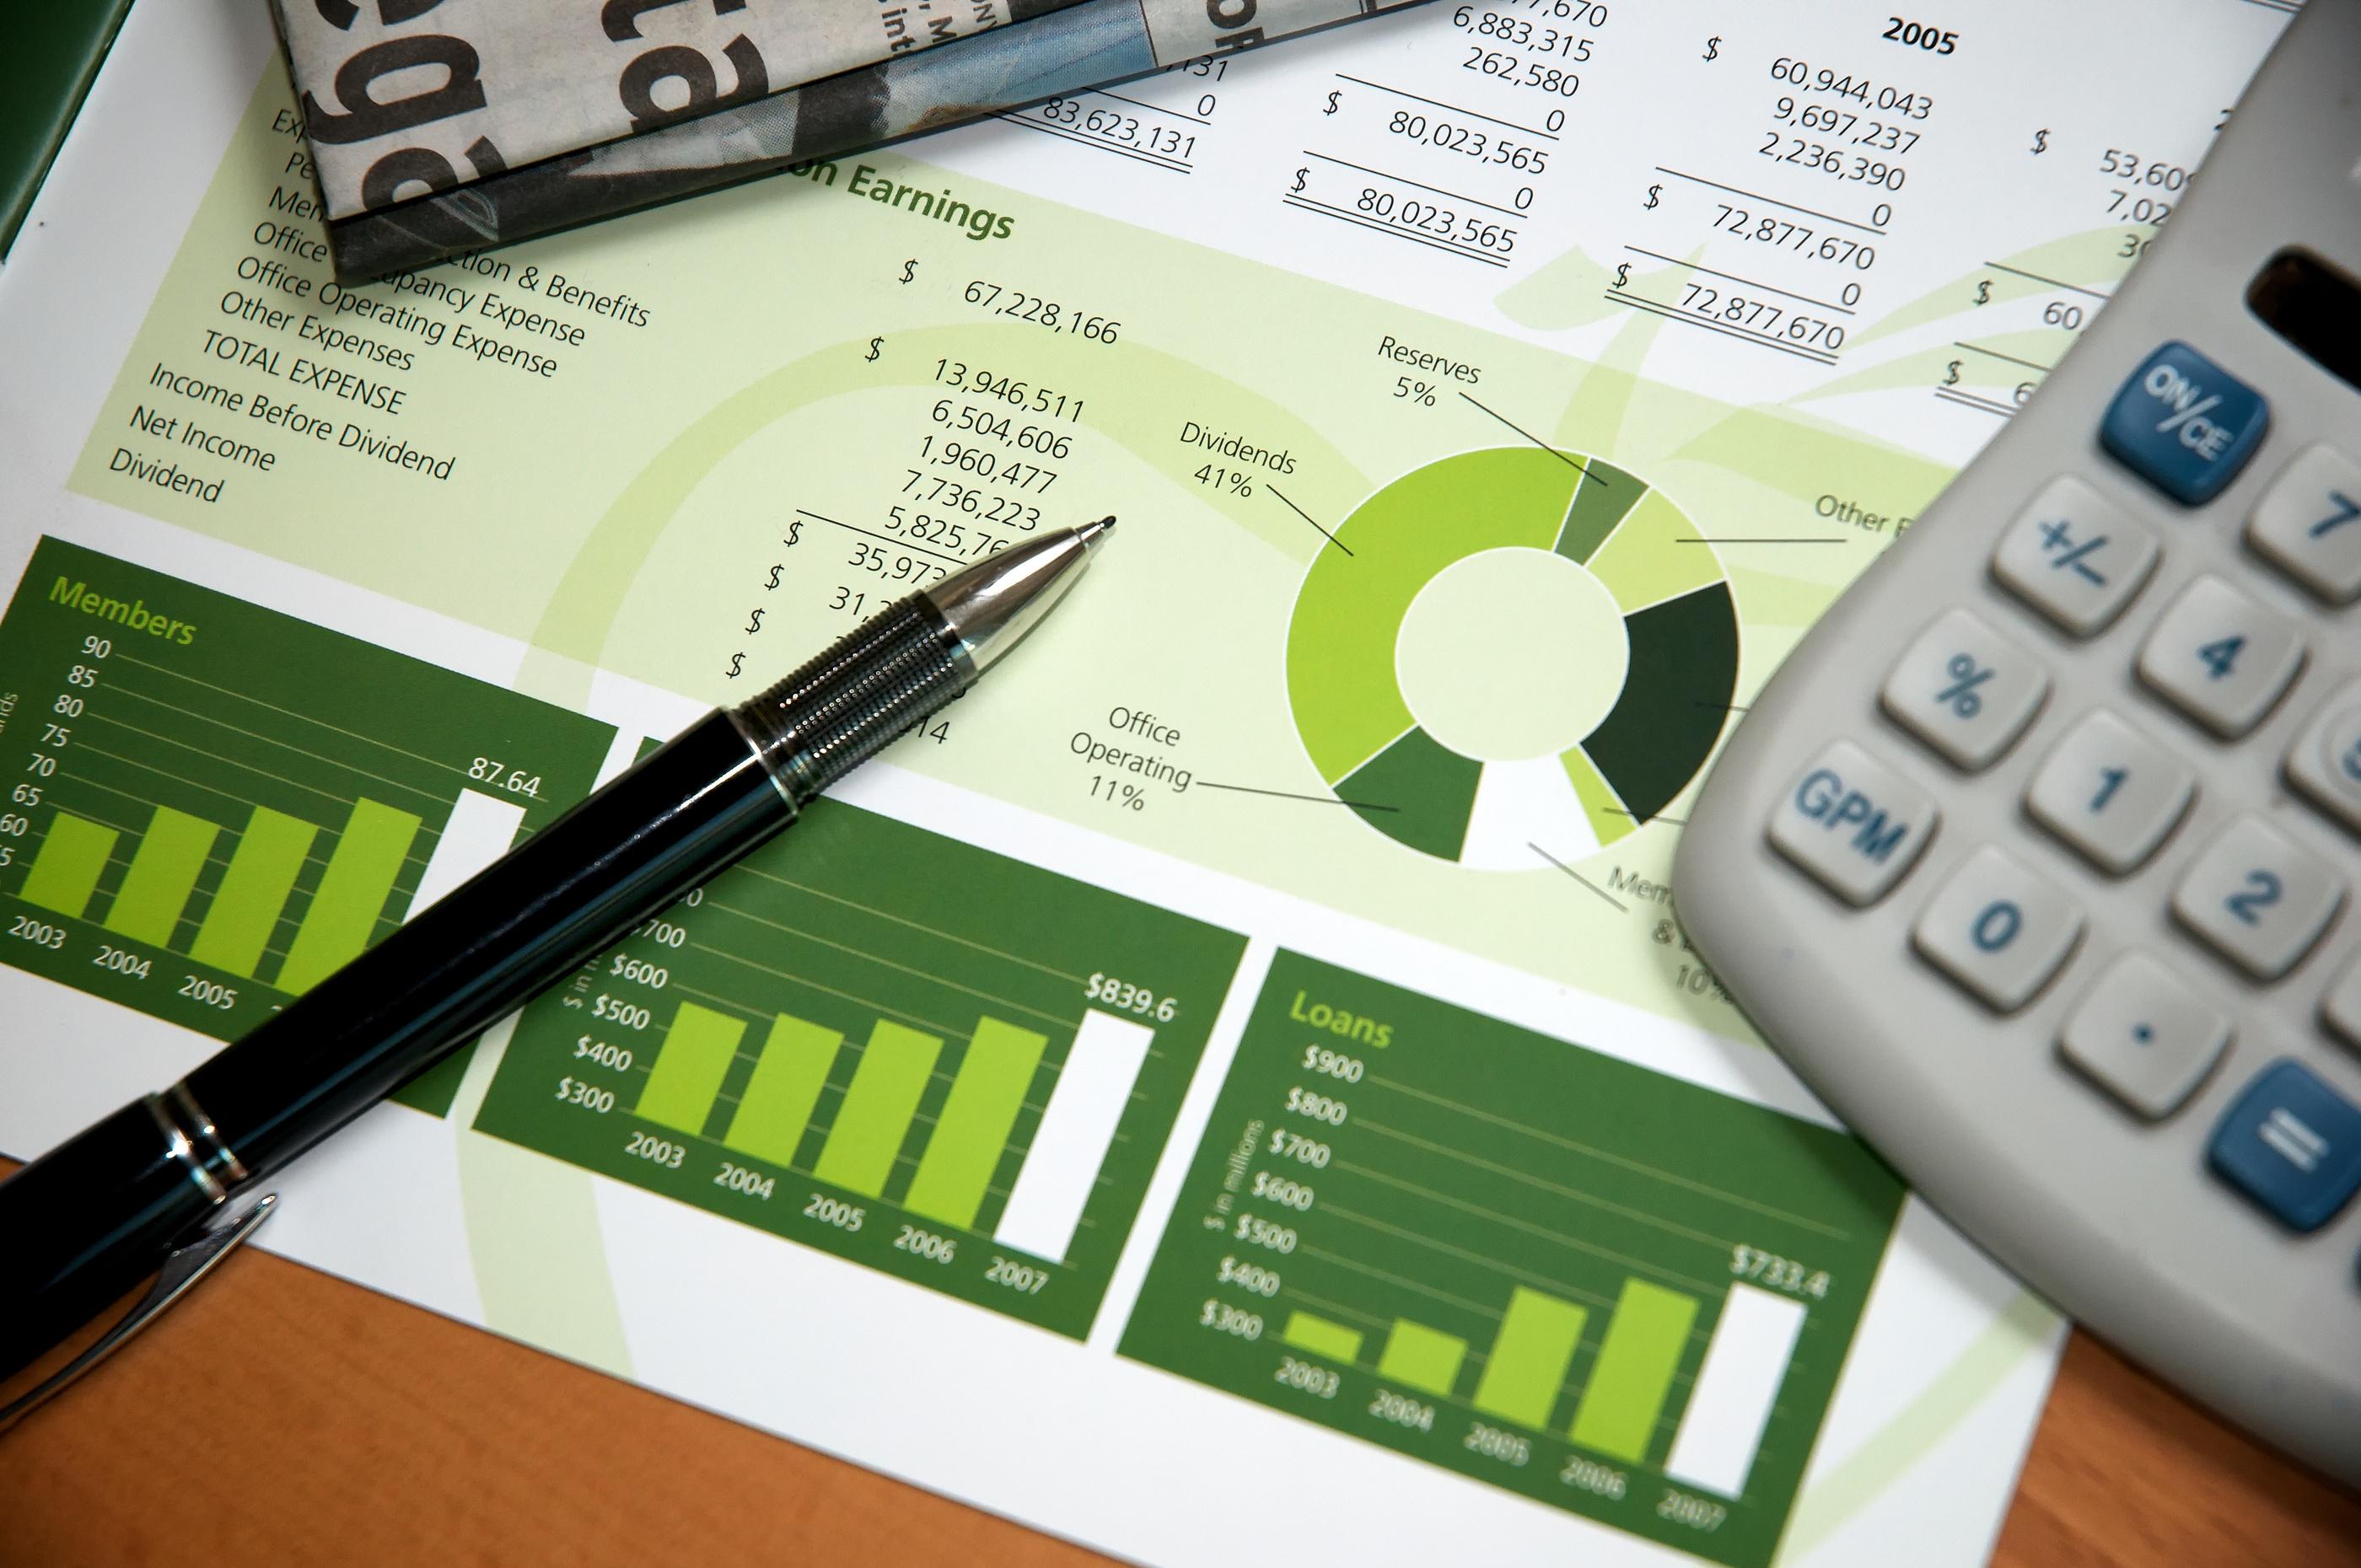 bigstock-Financial-Review-Desktop-5586814.jpg